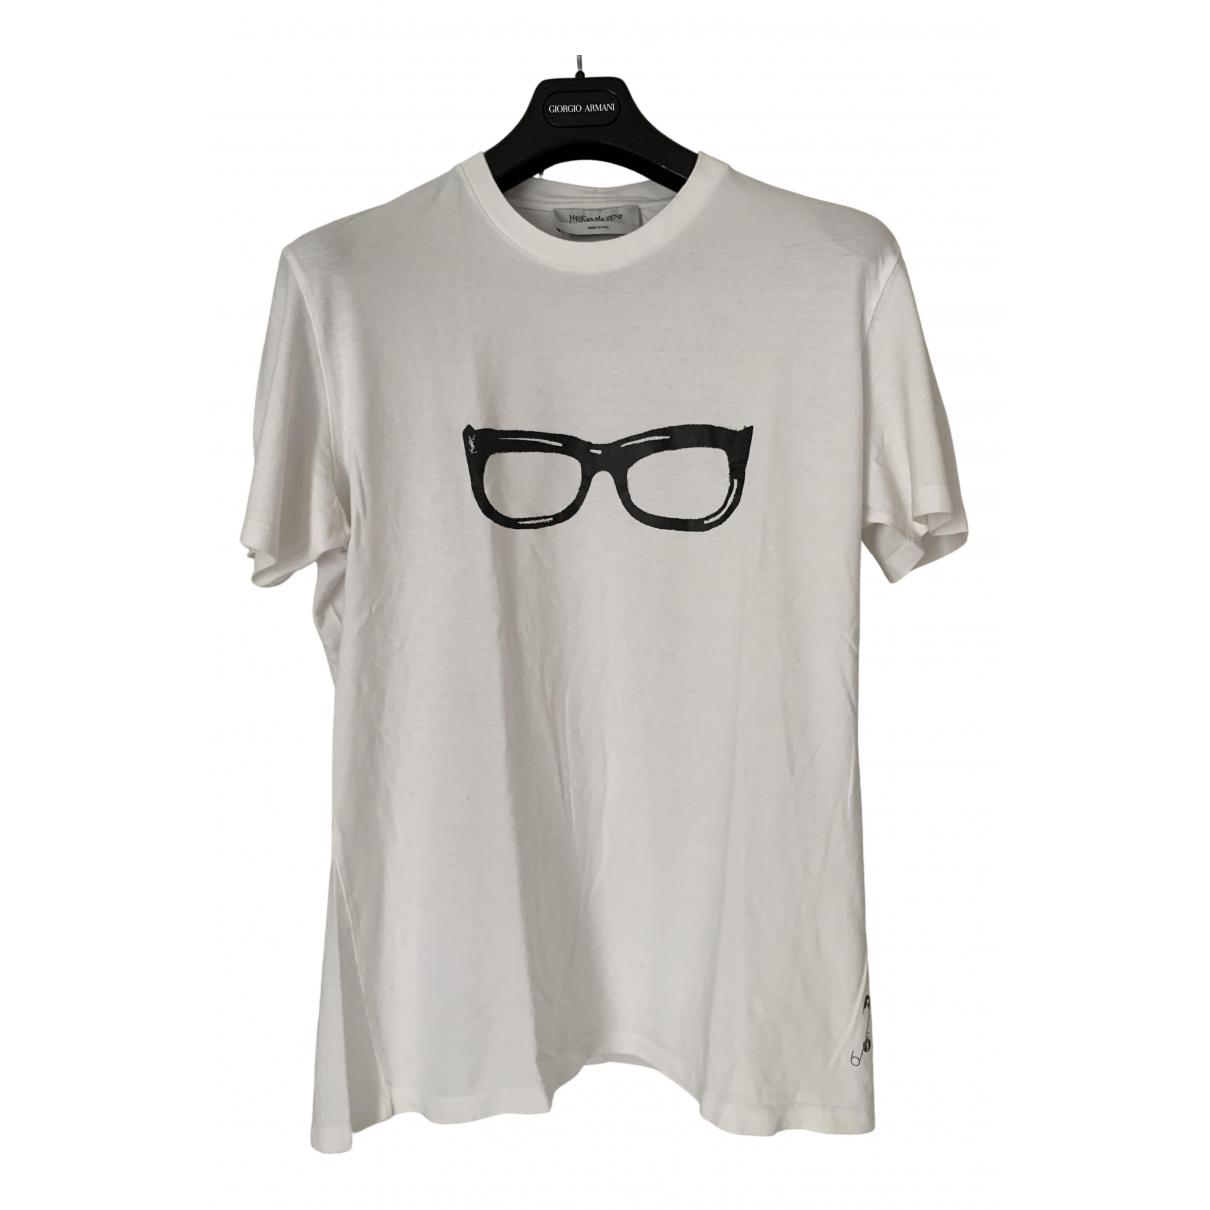 Yves Saint Laurent \N White Cotton T-shirts for Men L International